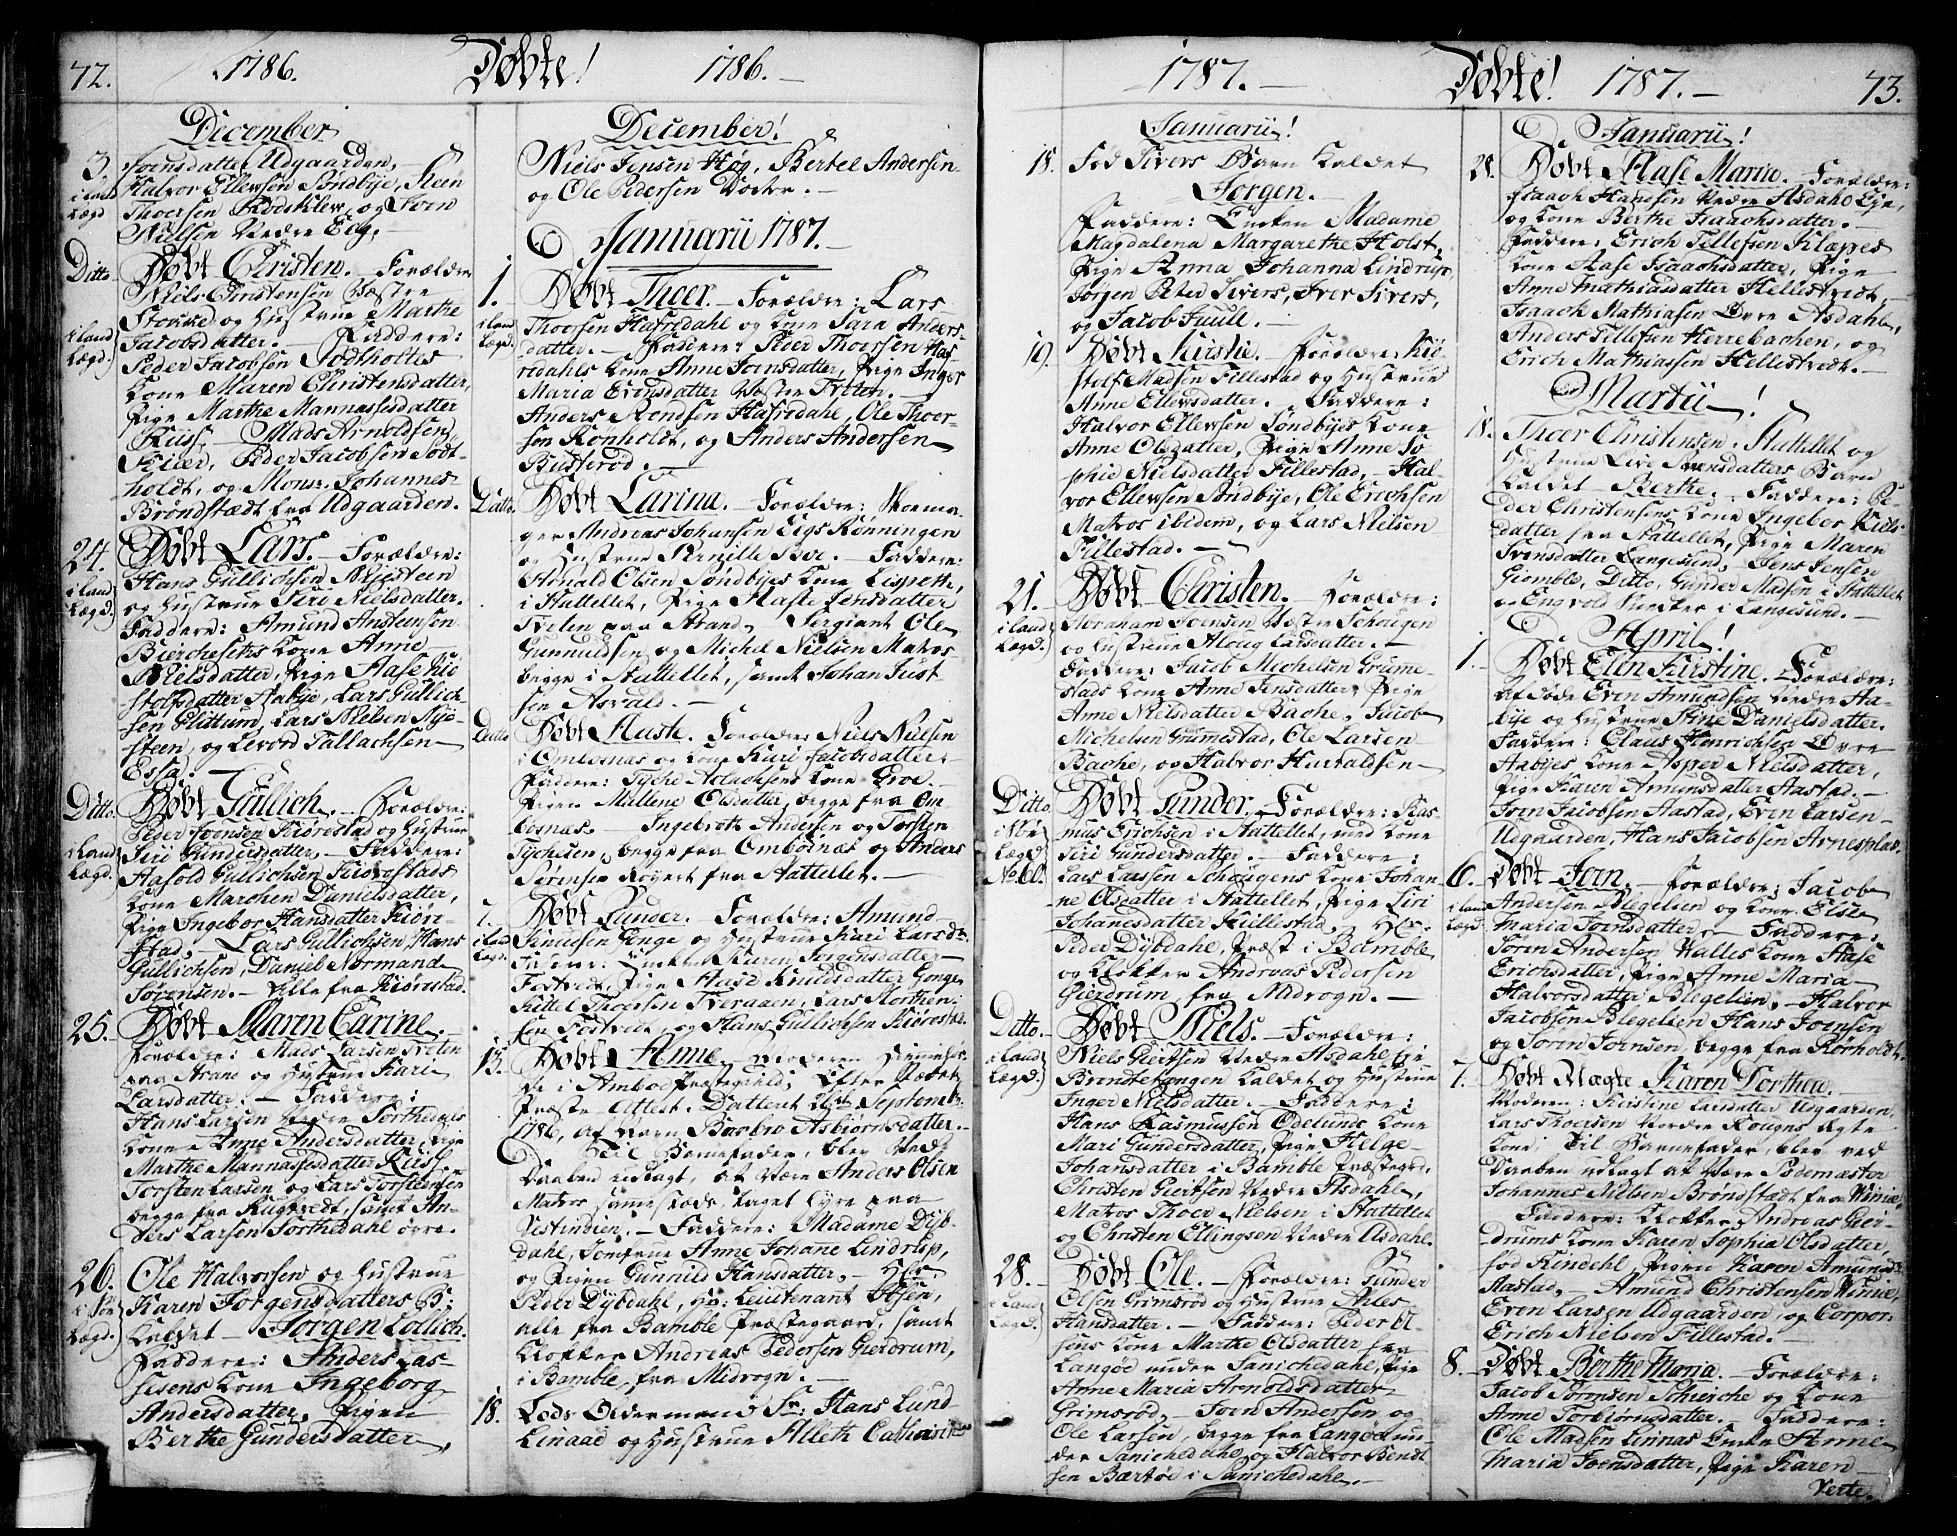 SAKO, Bamble kirkebøker, F/Fa/L0002: Ministerialbok nr. I 2, 1775-1814, s. 72-73